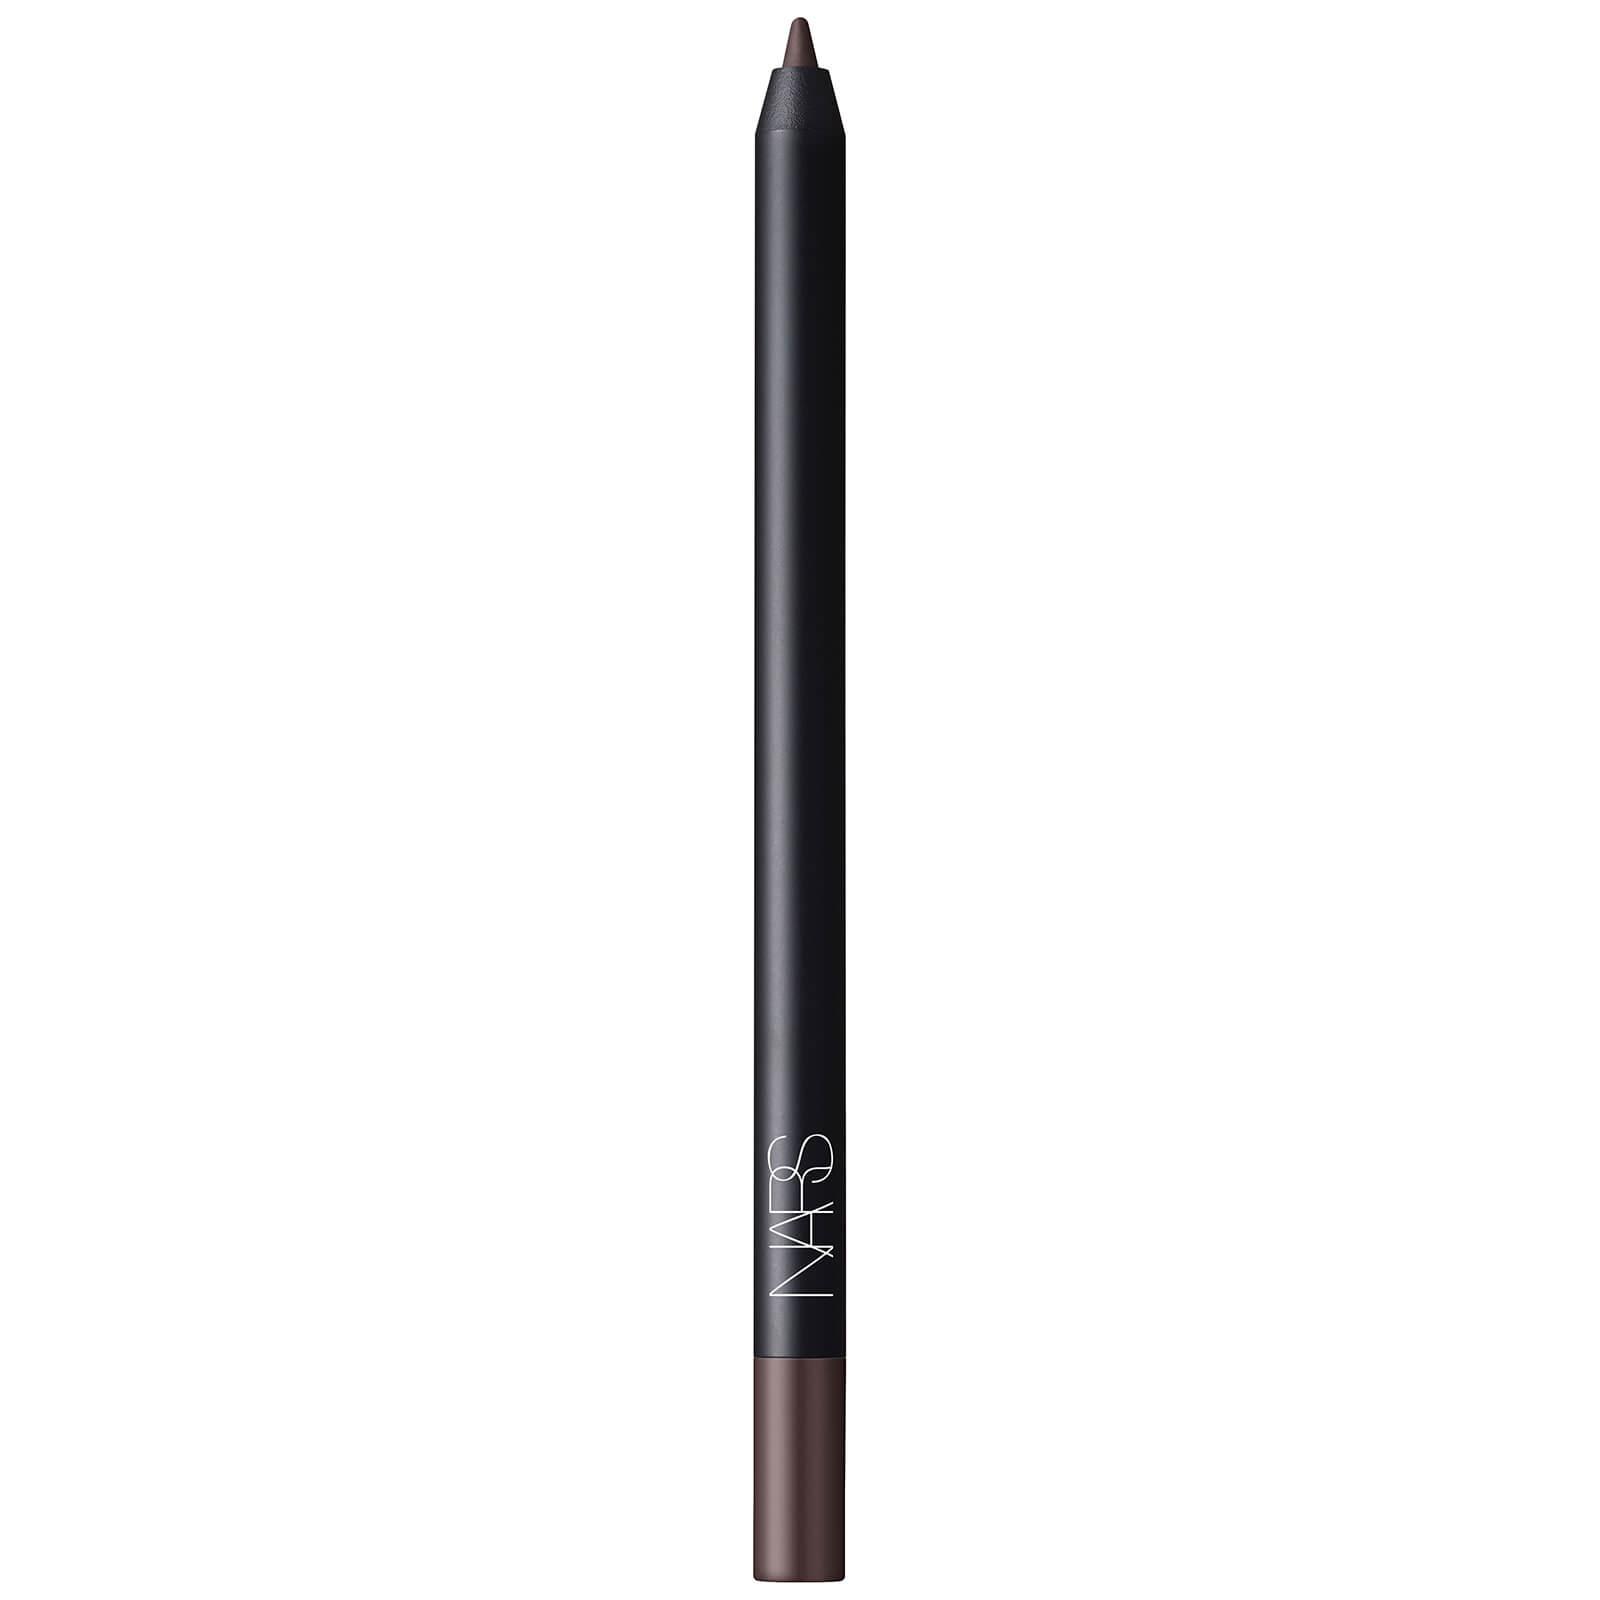 NARS High-Pigment Longwear Eyeliner 1.2g (Various Shades) - Last Frontie